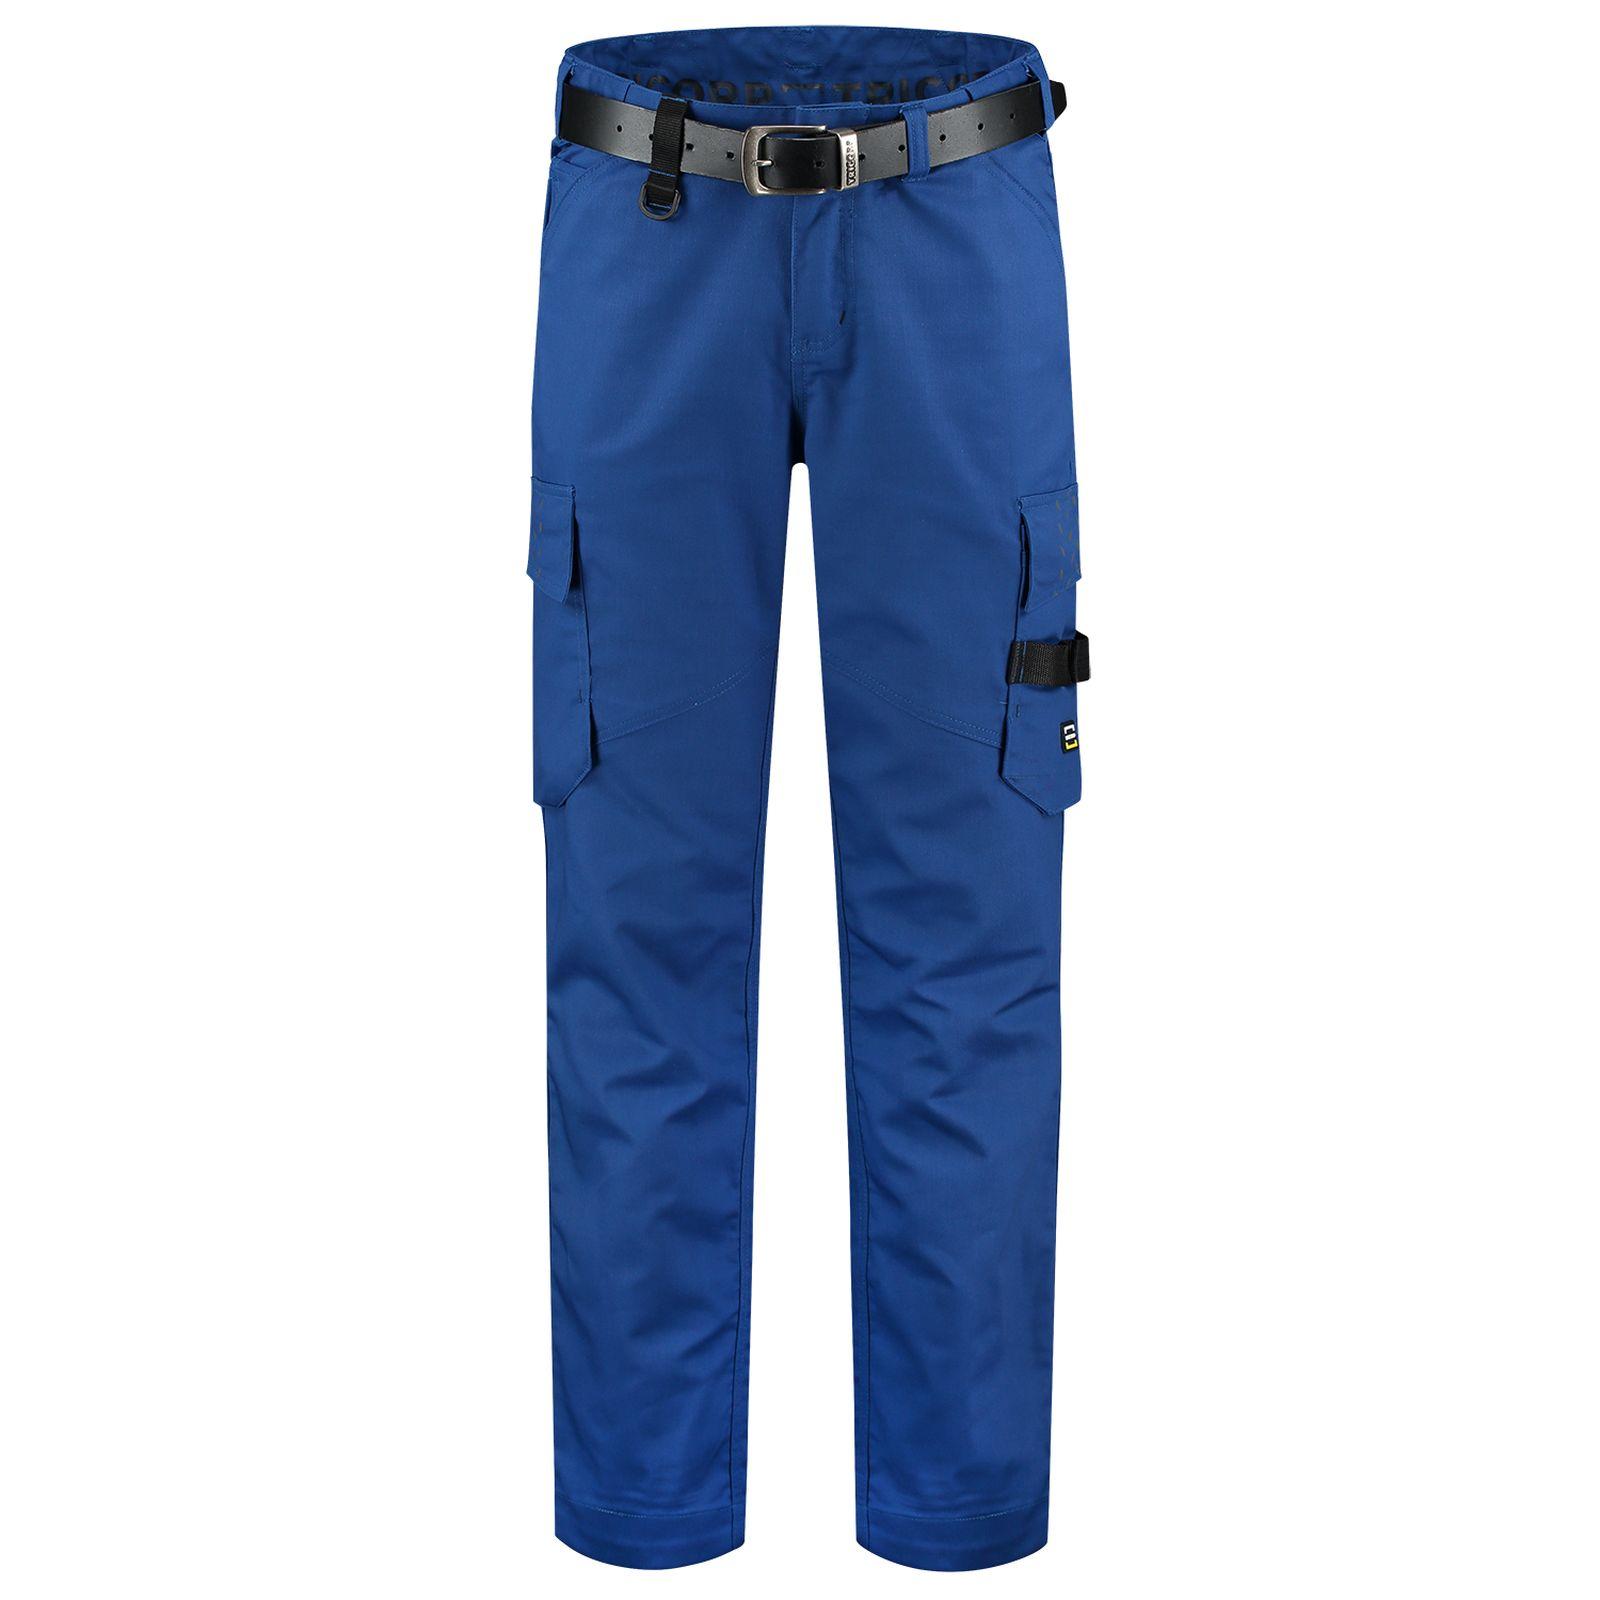 Tricorp Broeken 502023 koningsblauw(Royalblue)